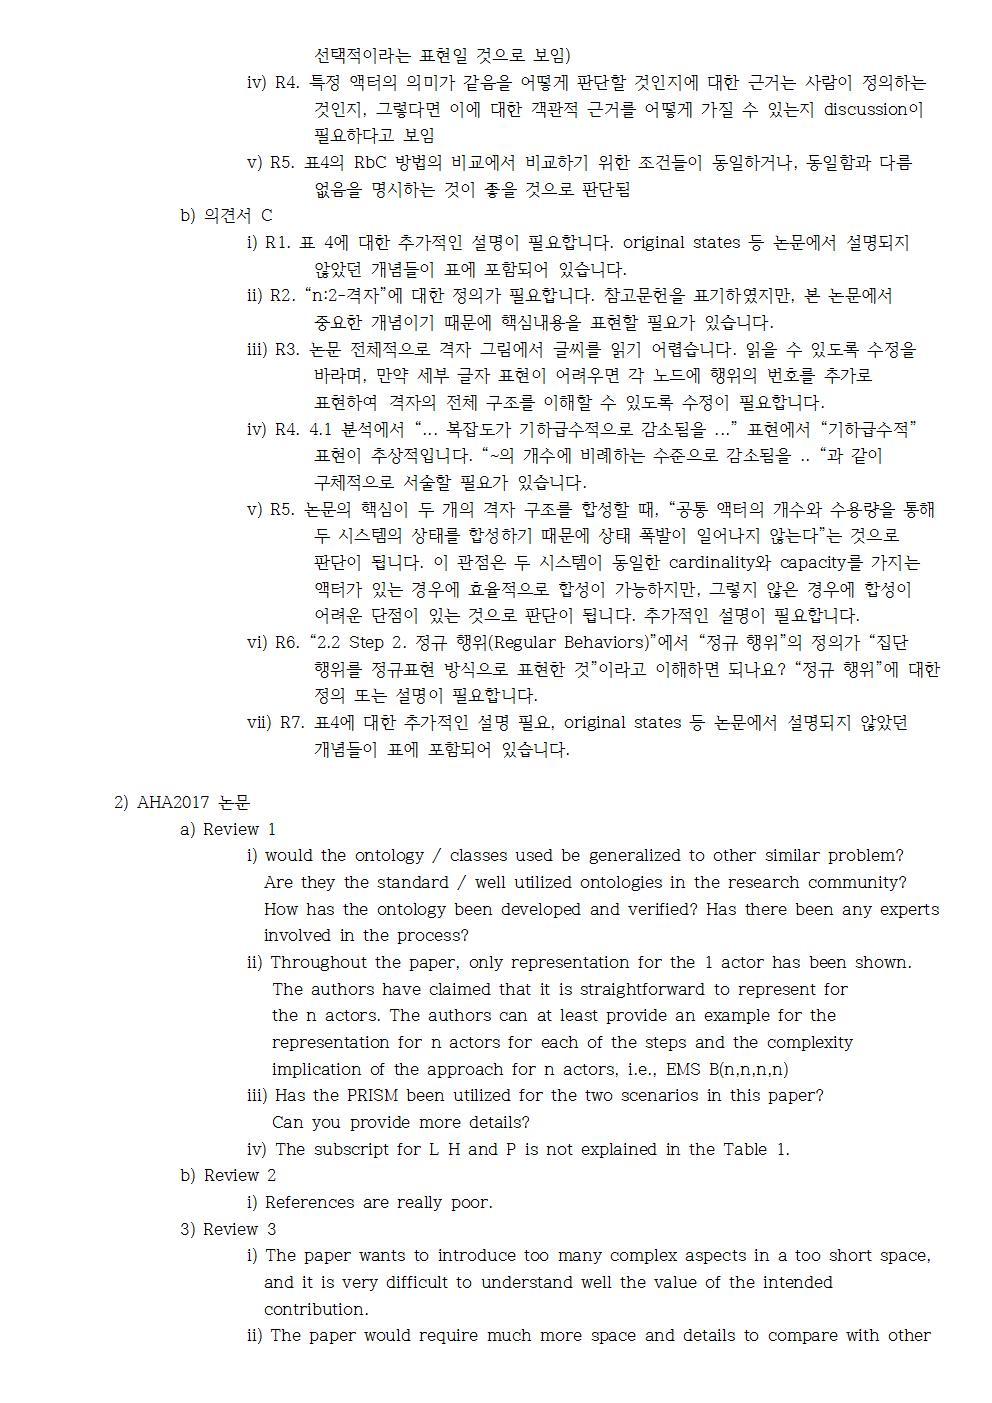 D-[17-089-PP-15]-[Bahevior Ontology 논문]-[JS]-[2017-09-25]002.jpg